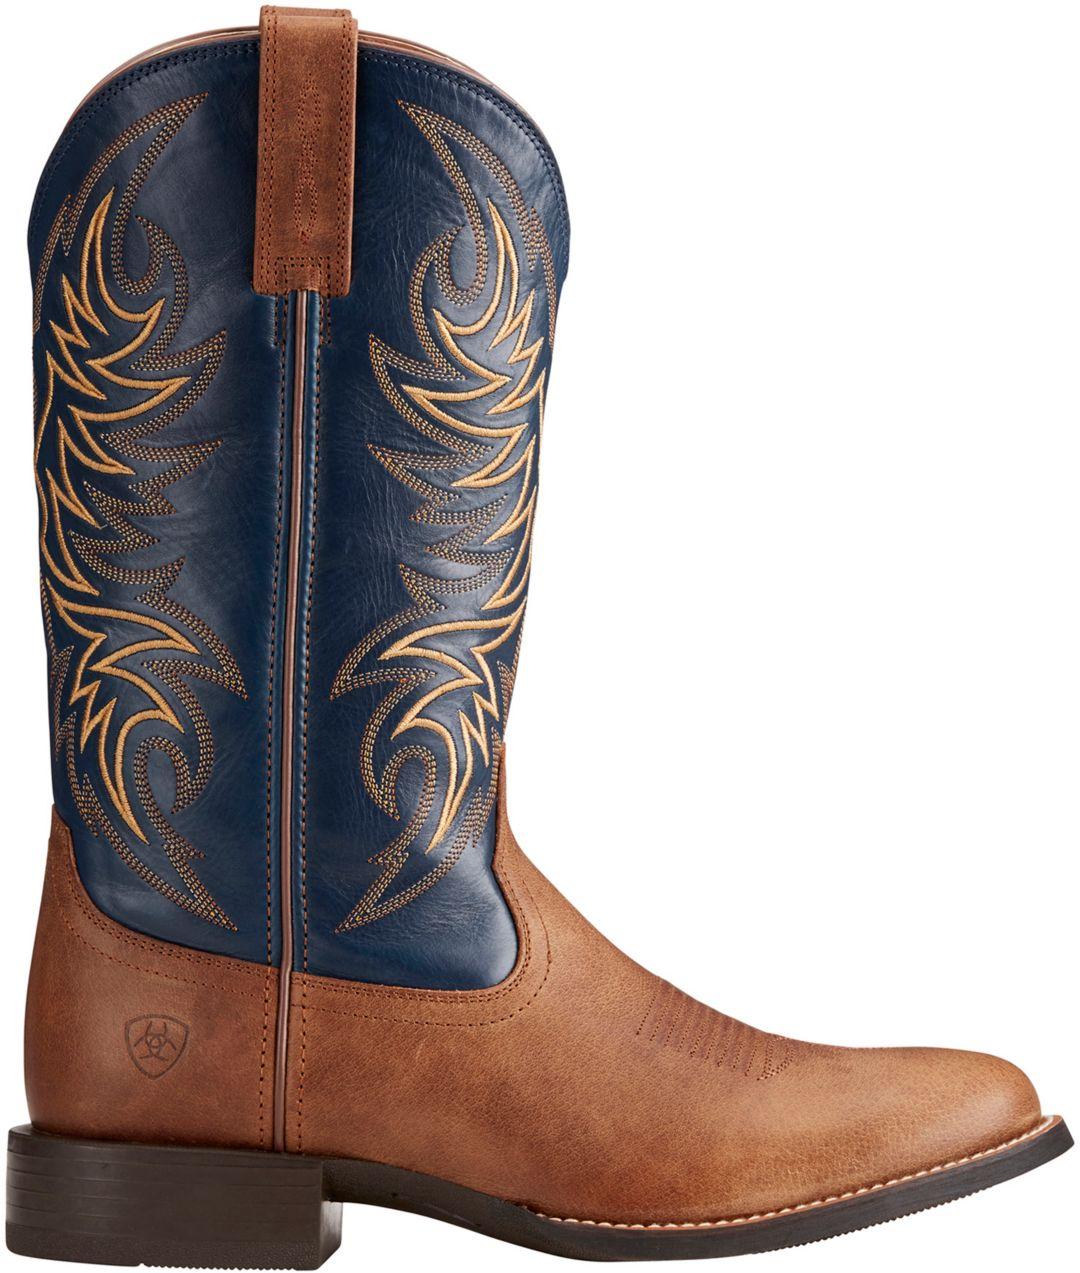 b3efdfec6b4 Ariat Men's Sport Horseman Western Work Boots